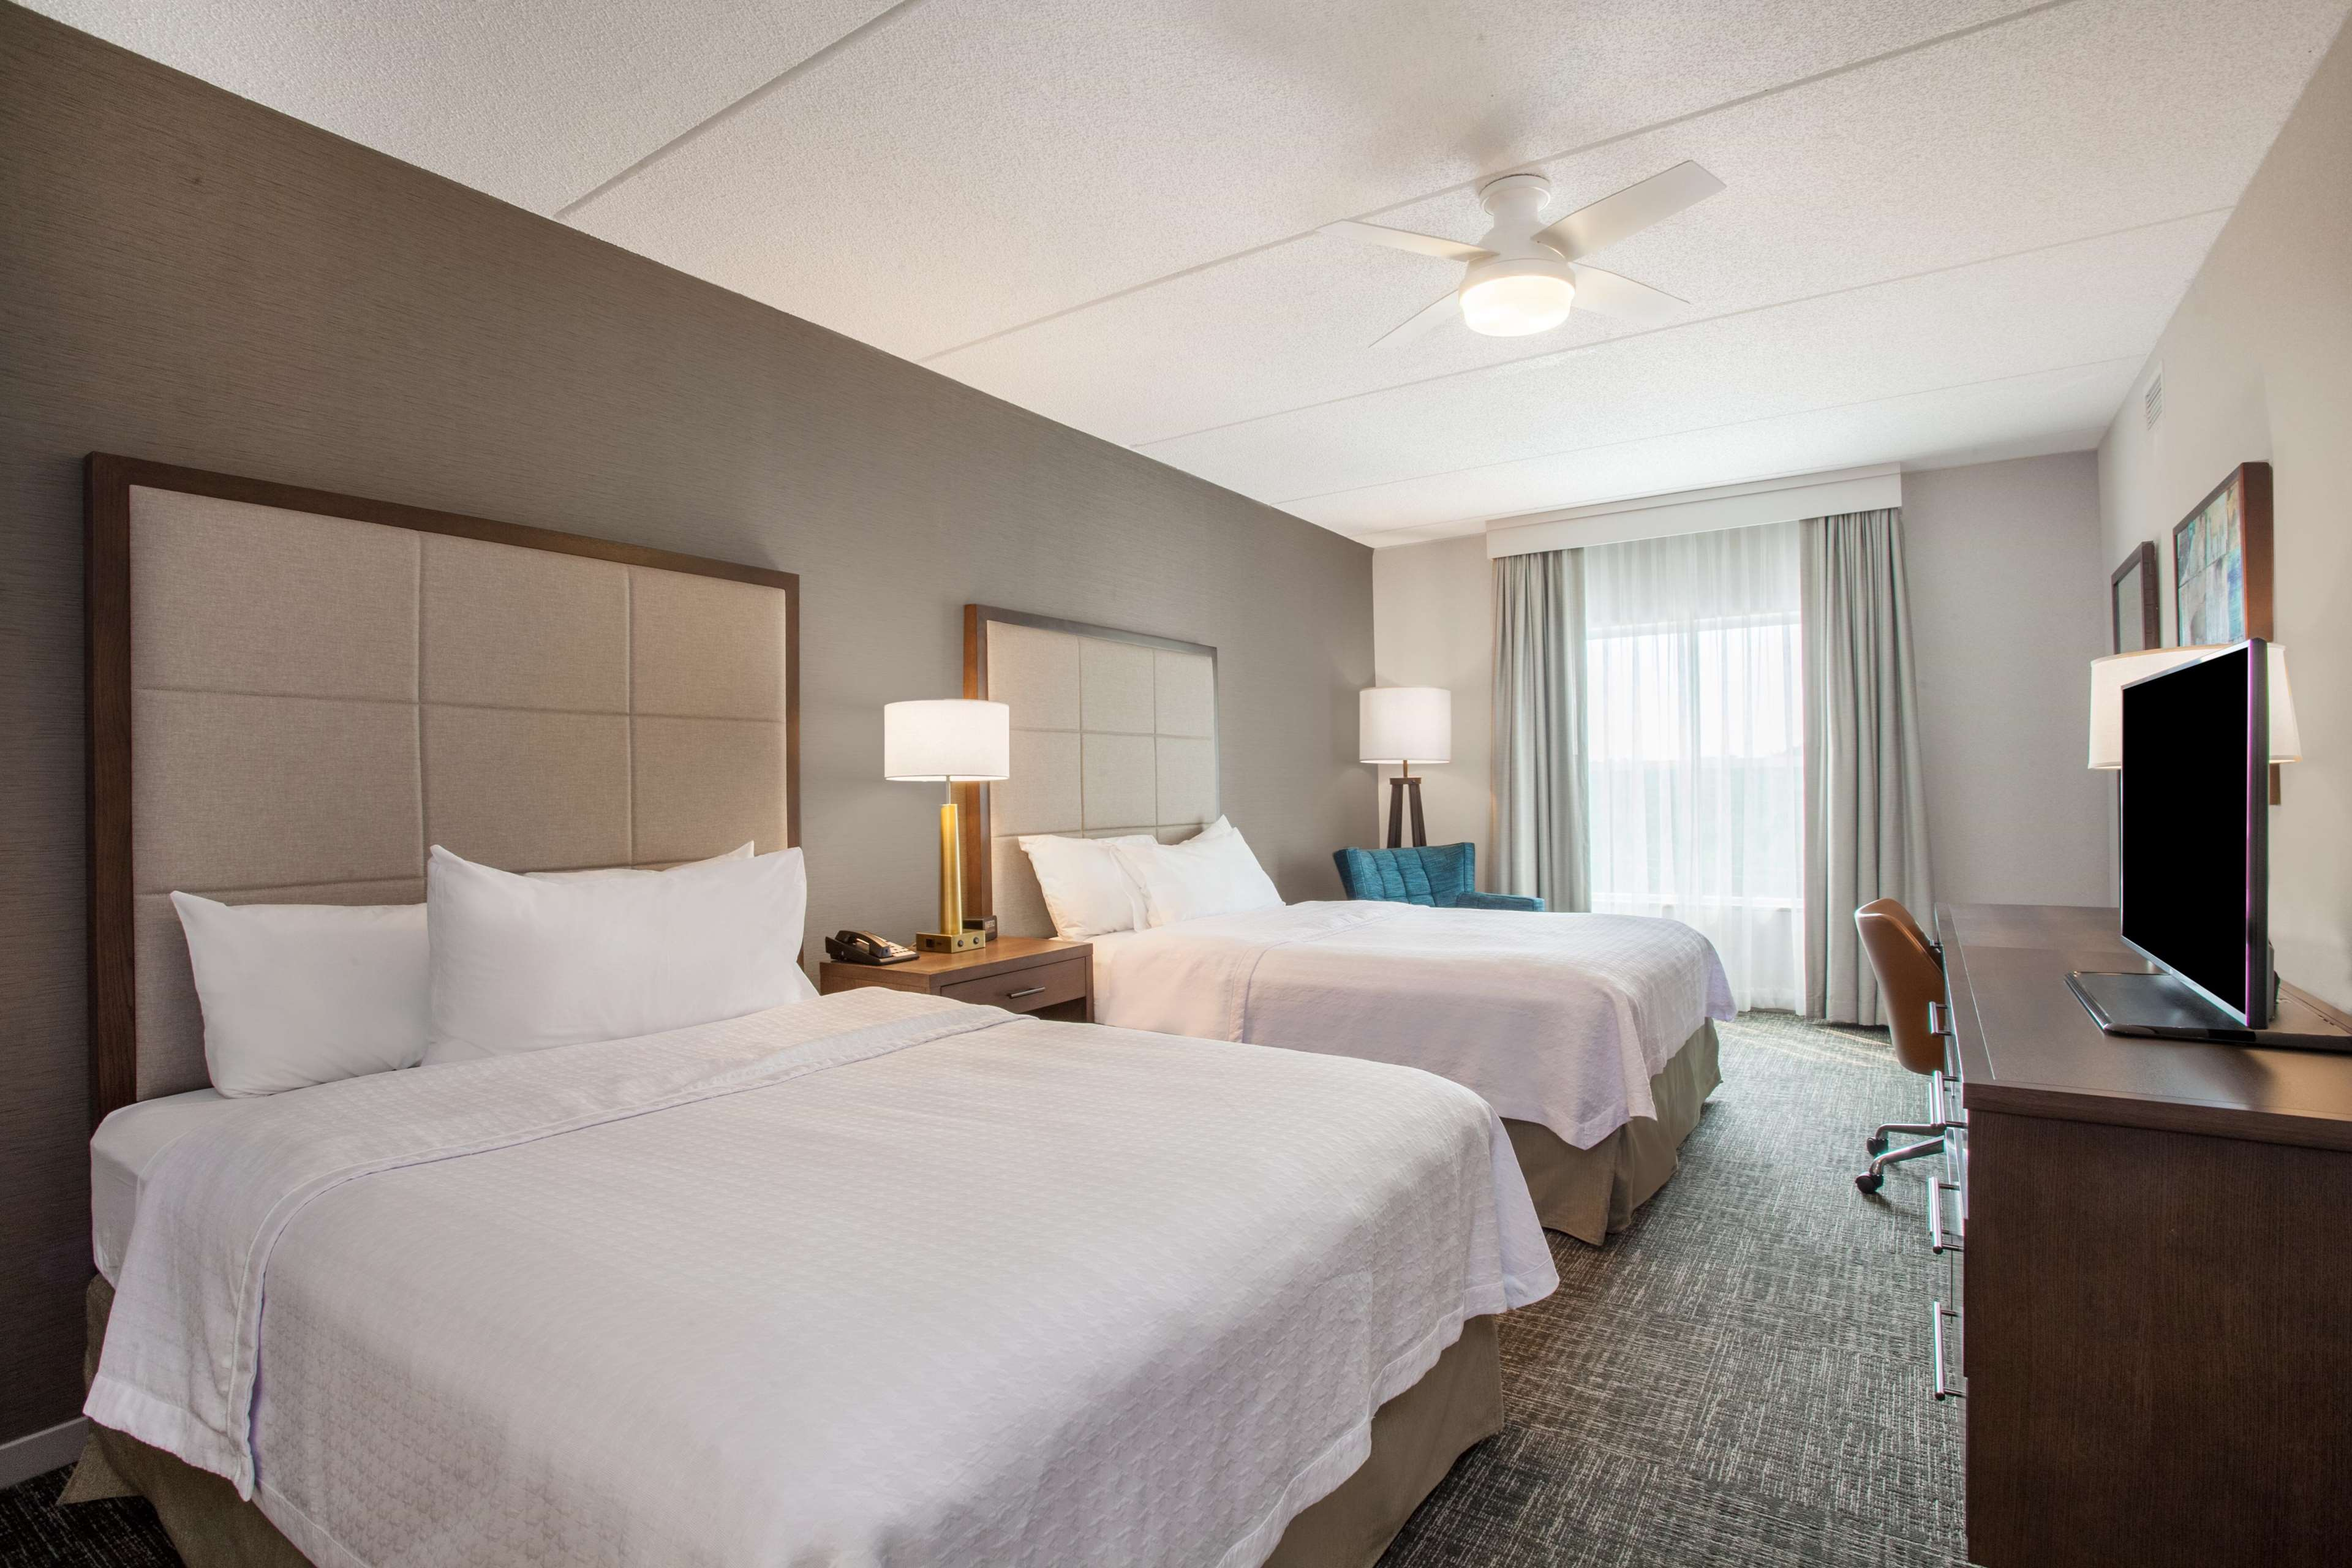 Homewood Suites by Hilton Saratoga Springs image 28